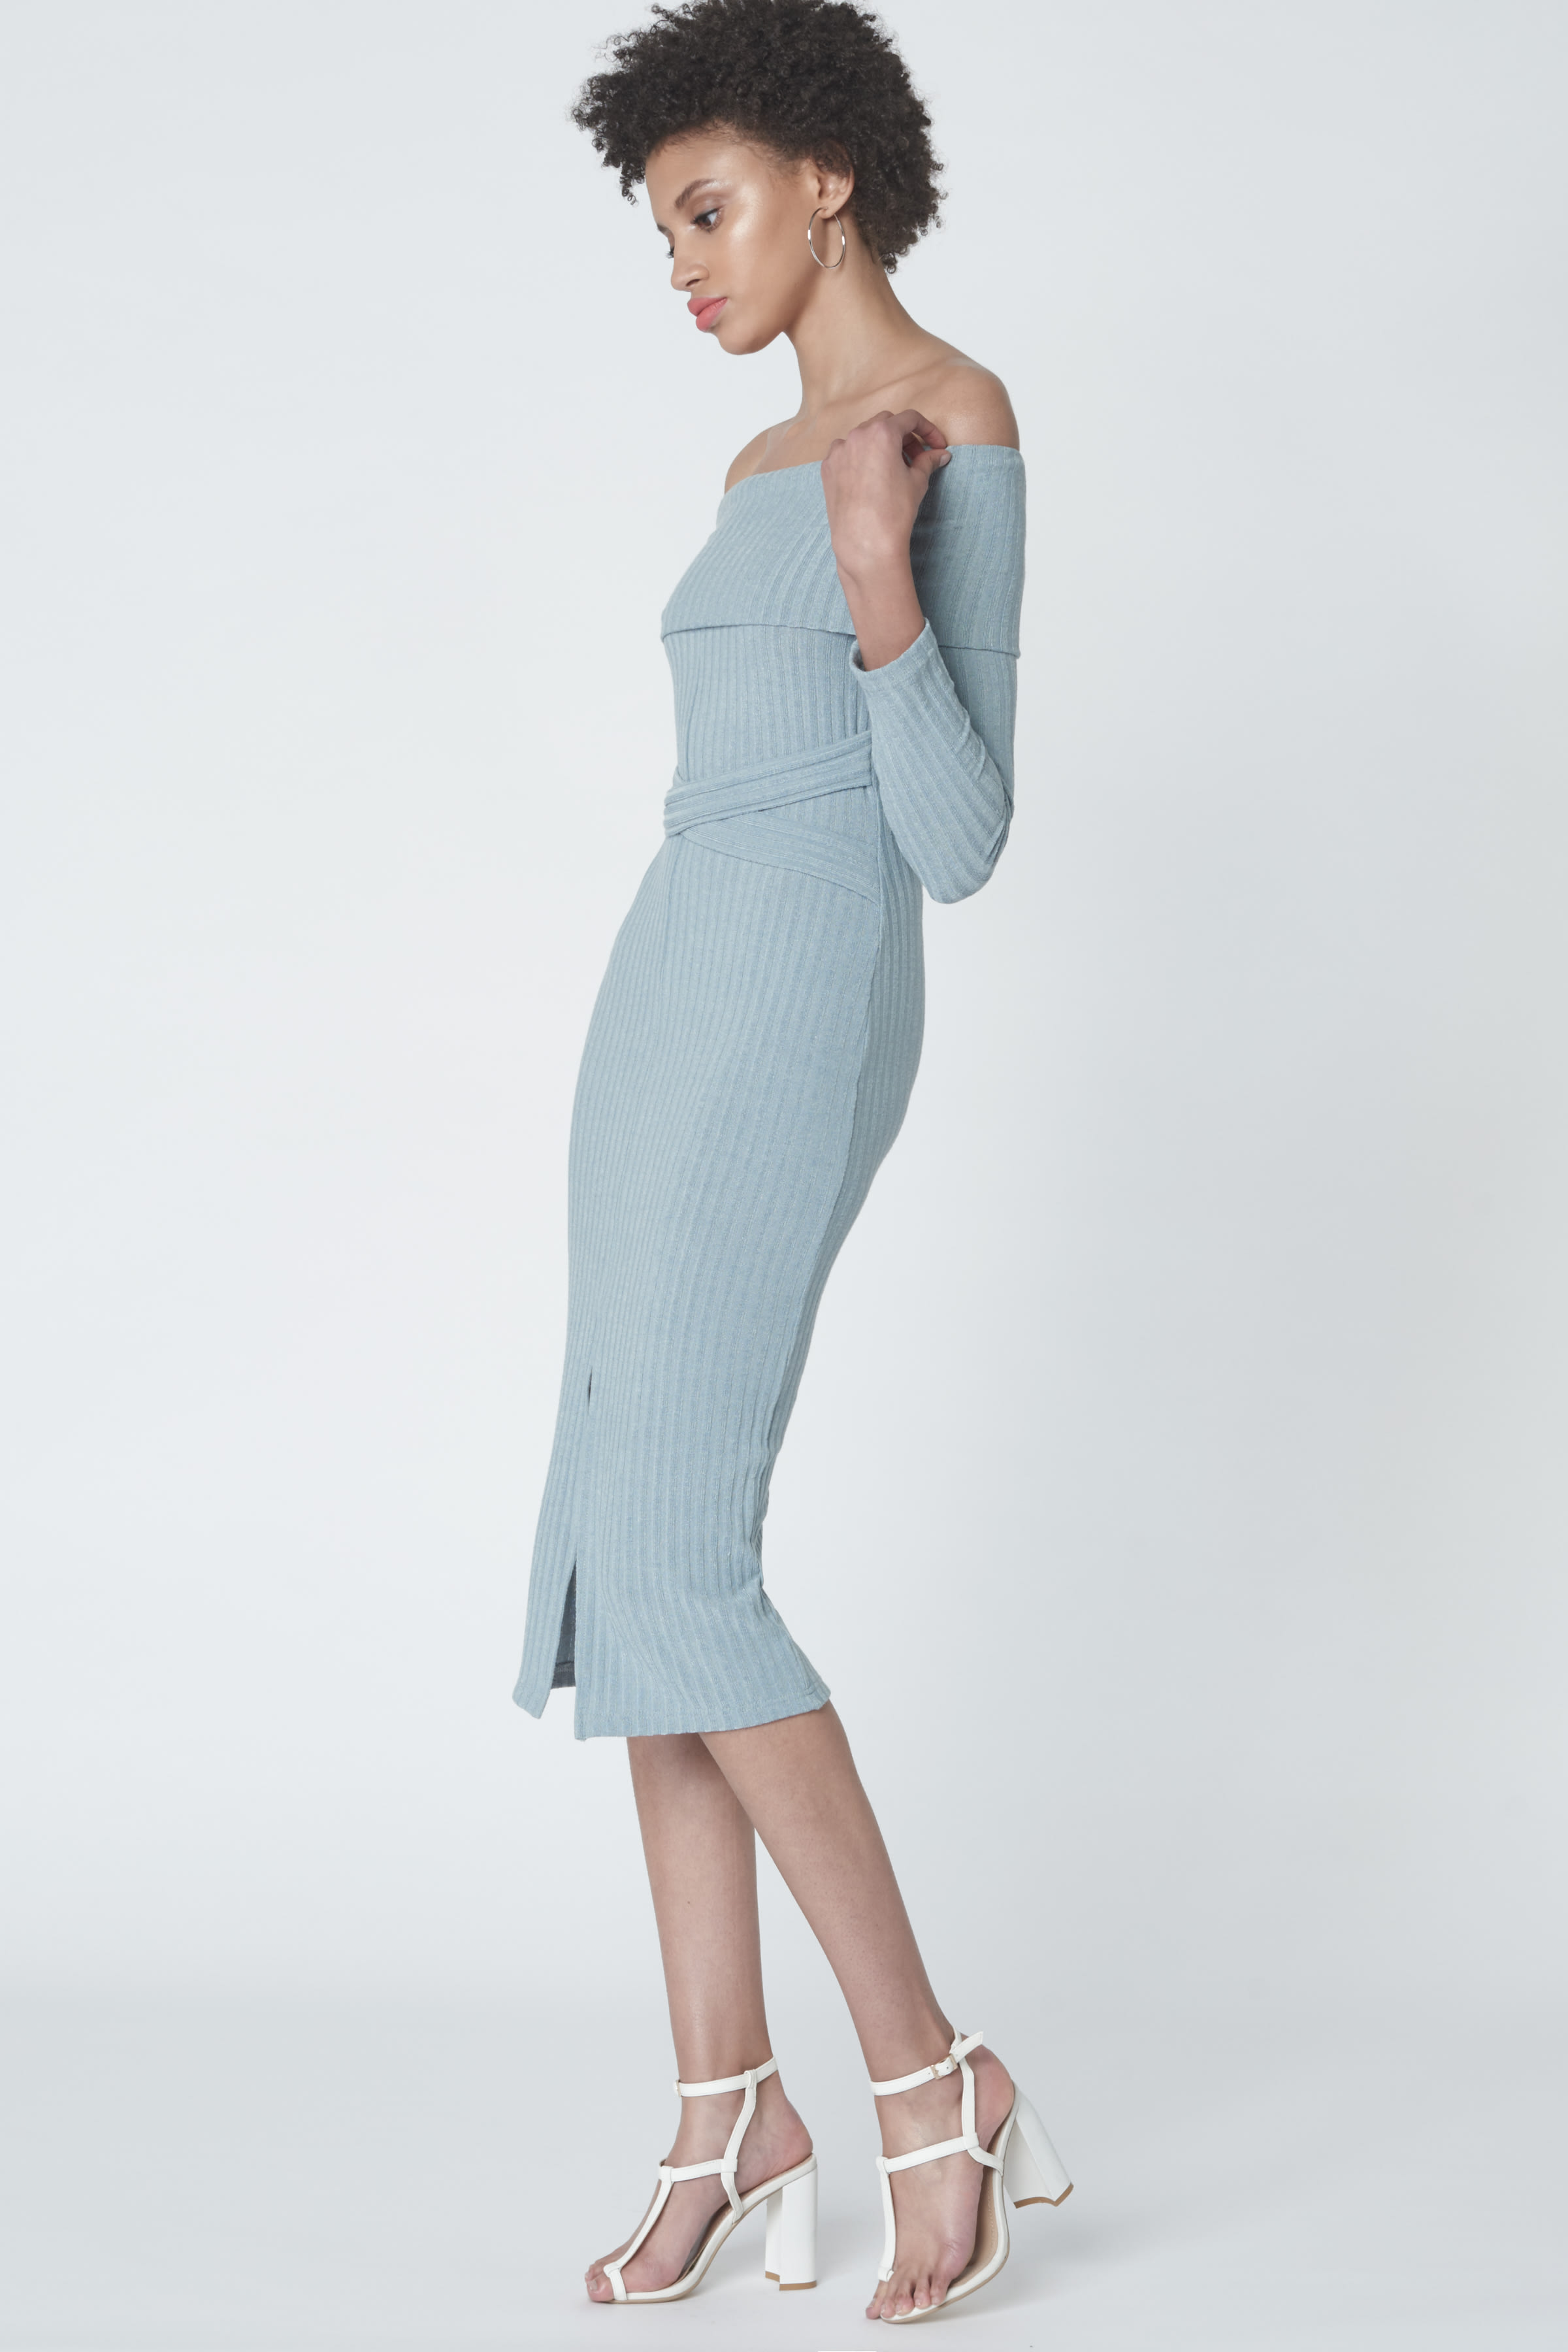 Criss Cross Strapless Dress in Powder Blue Knit